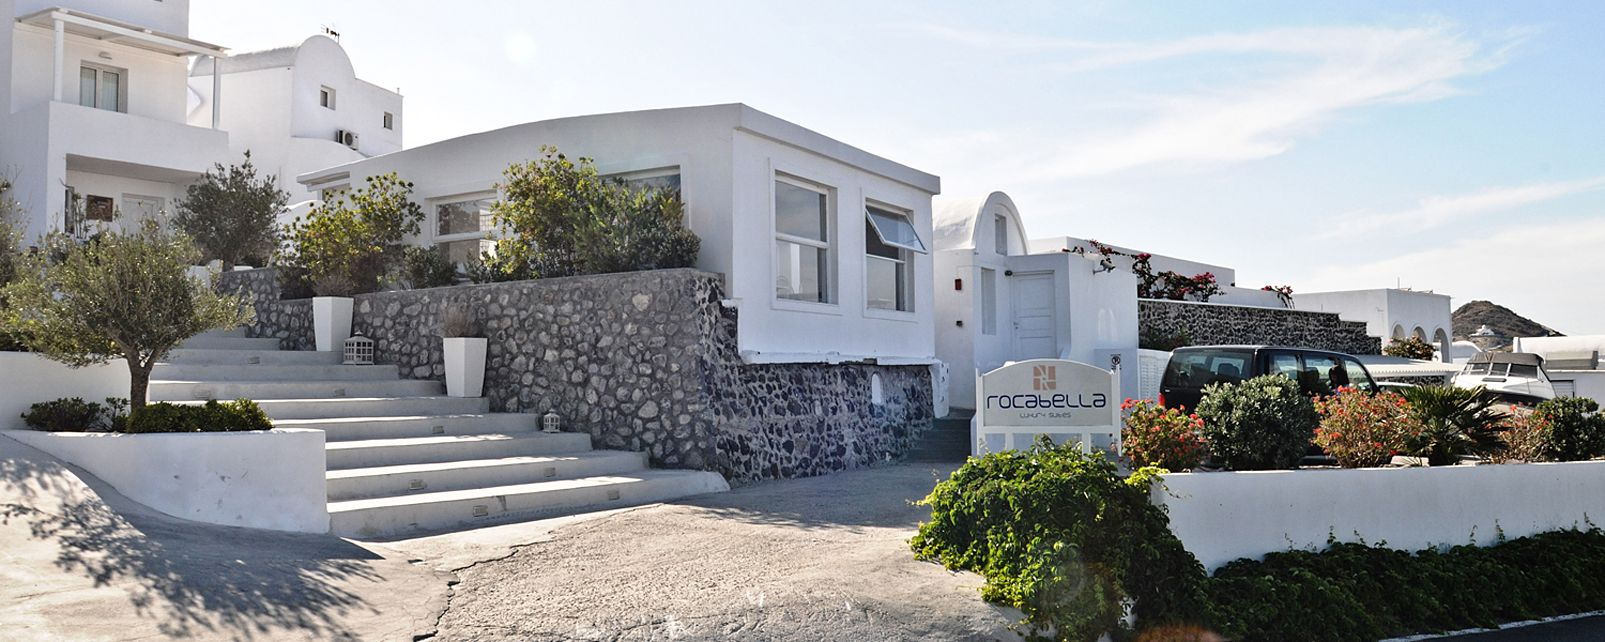 Hotel Rocabella Resort